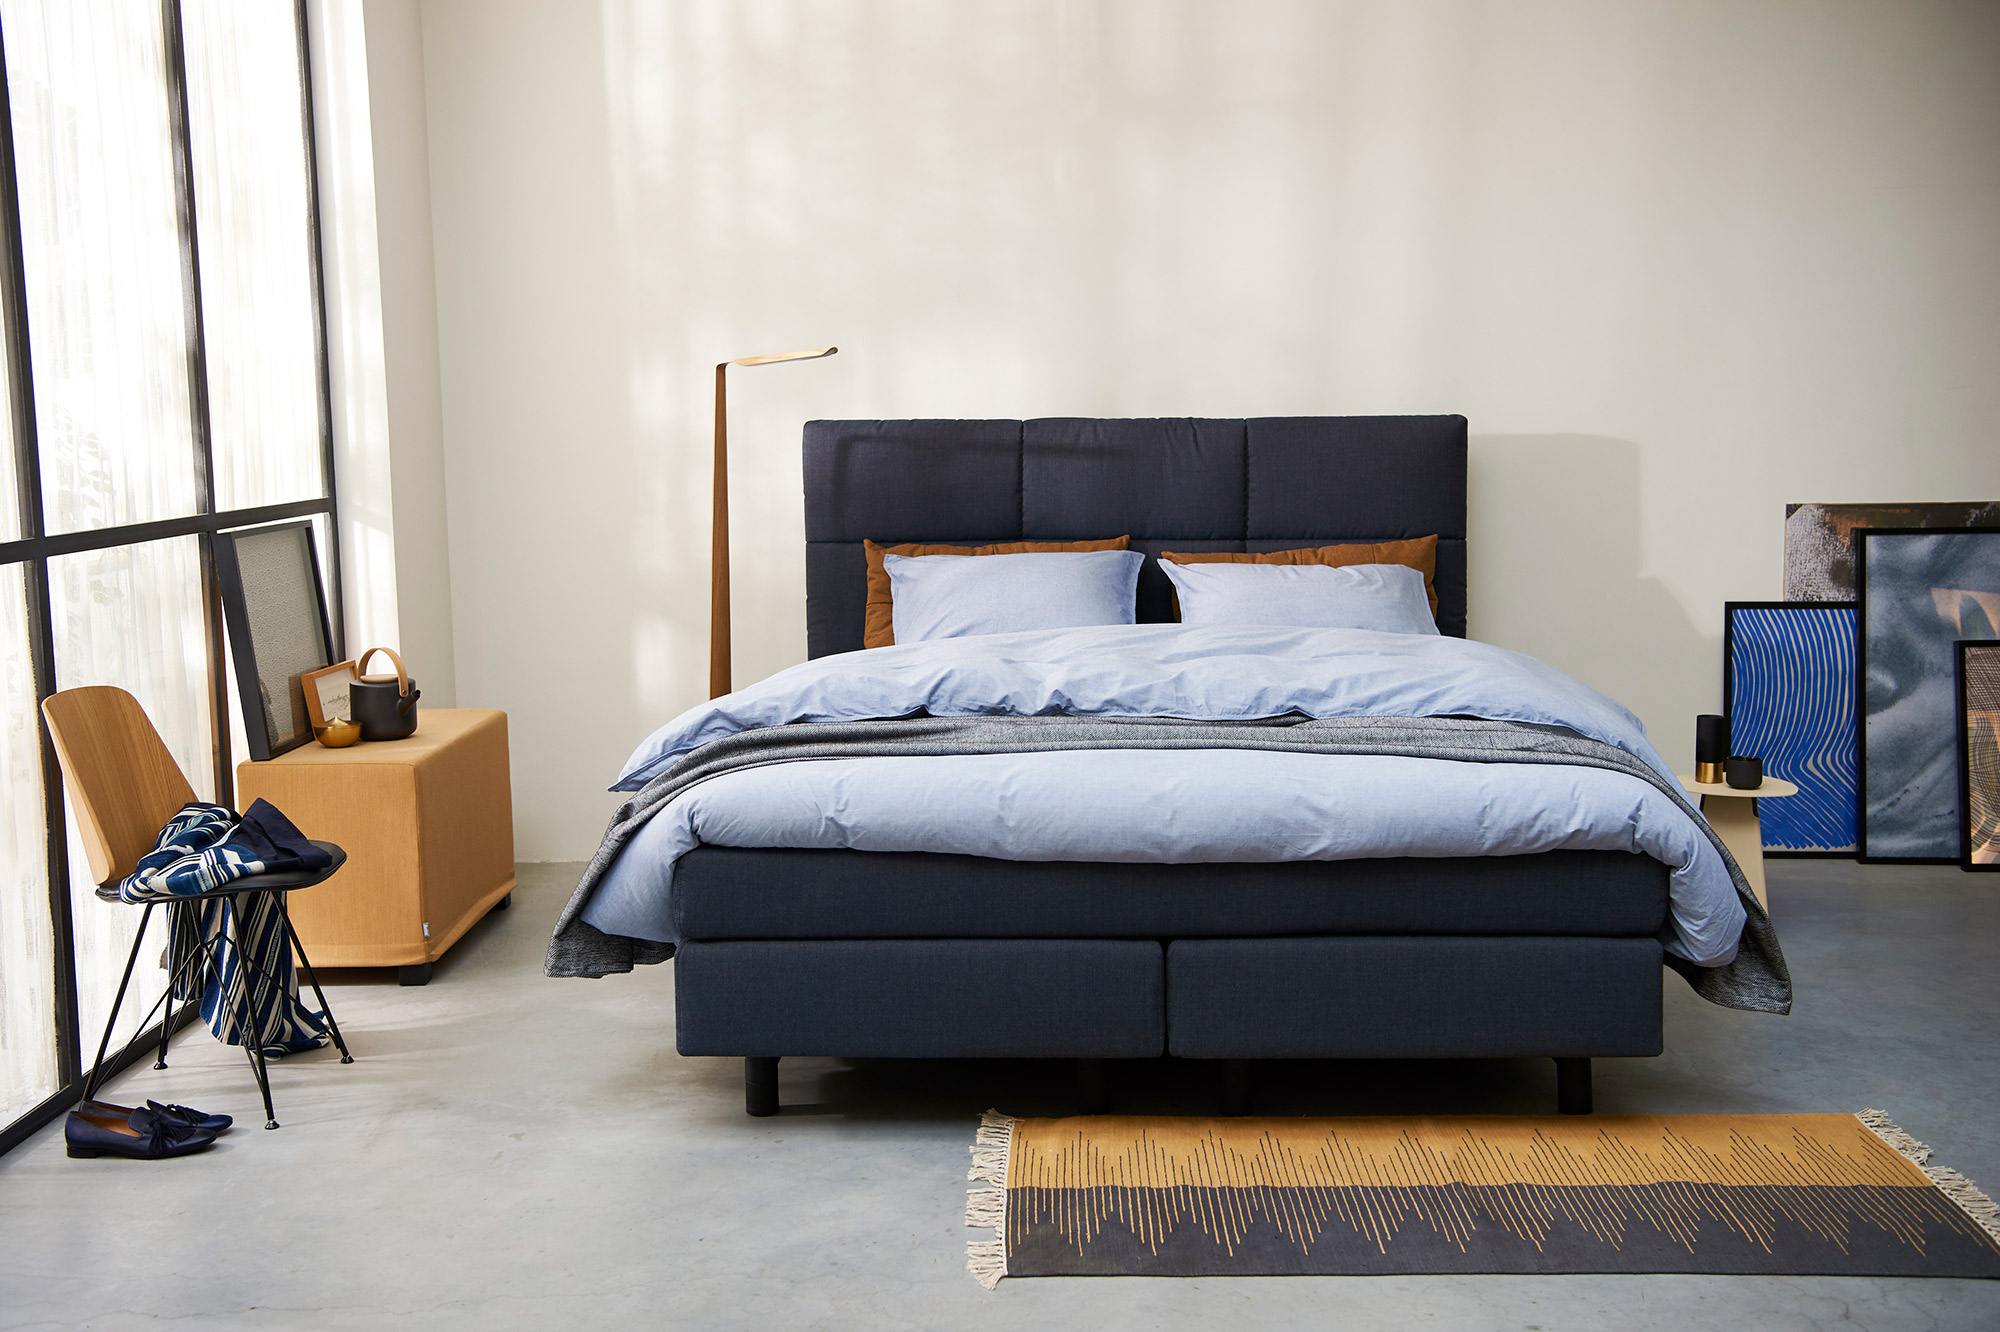 Auping zomer slaapkamer